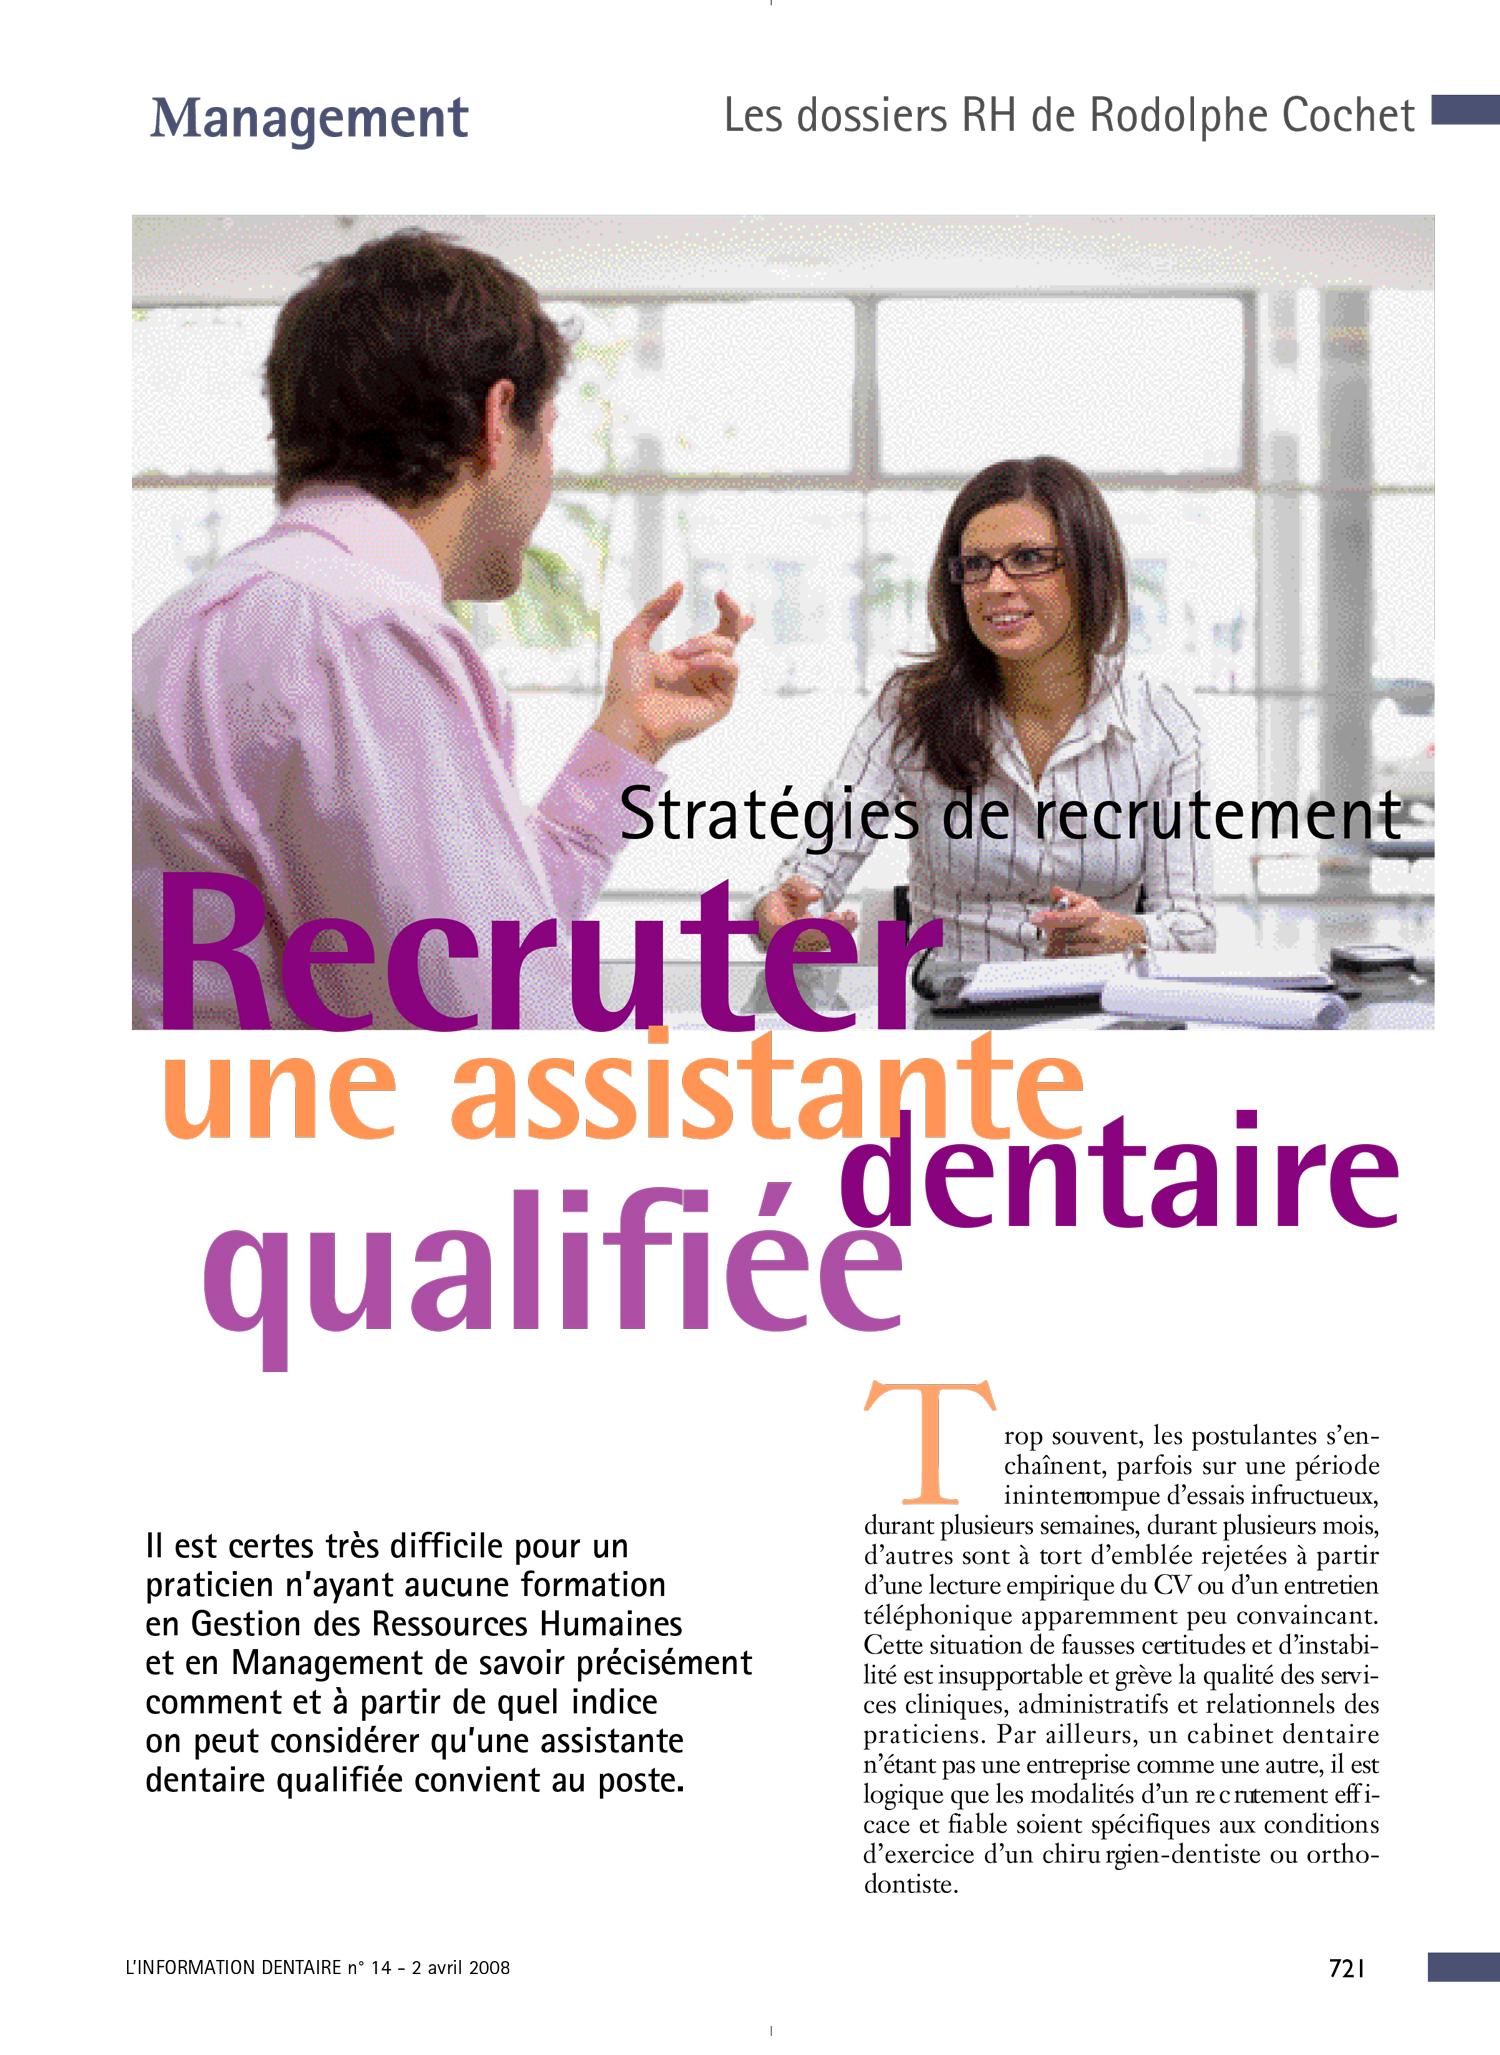 Recruter-une-assistante-dentaire-qualifiee-experimentee-Rodolphe_Cochet-1.jpg